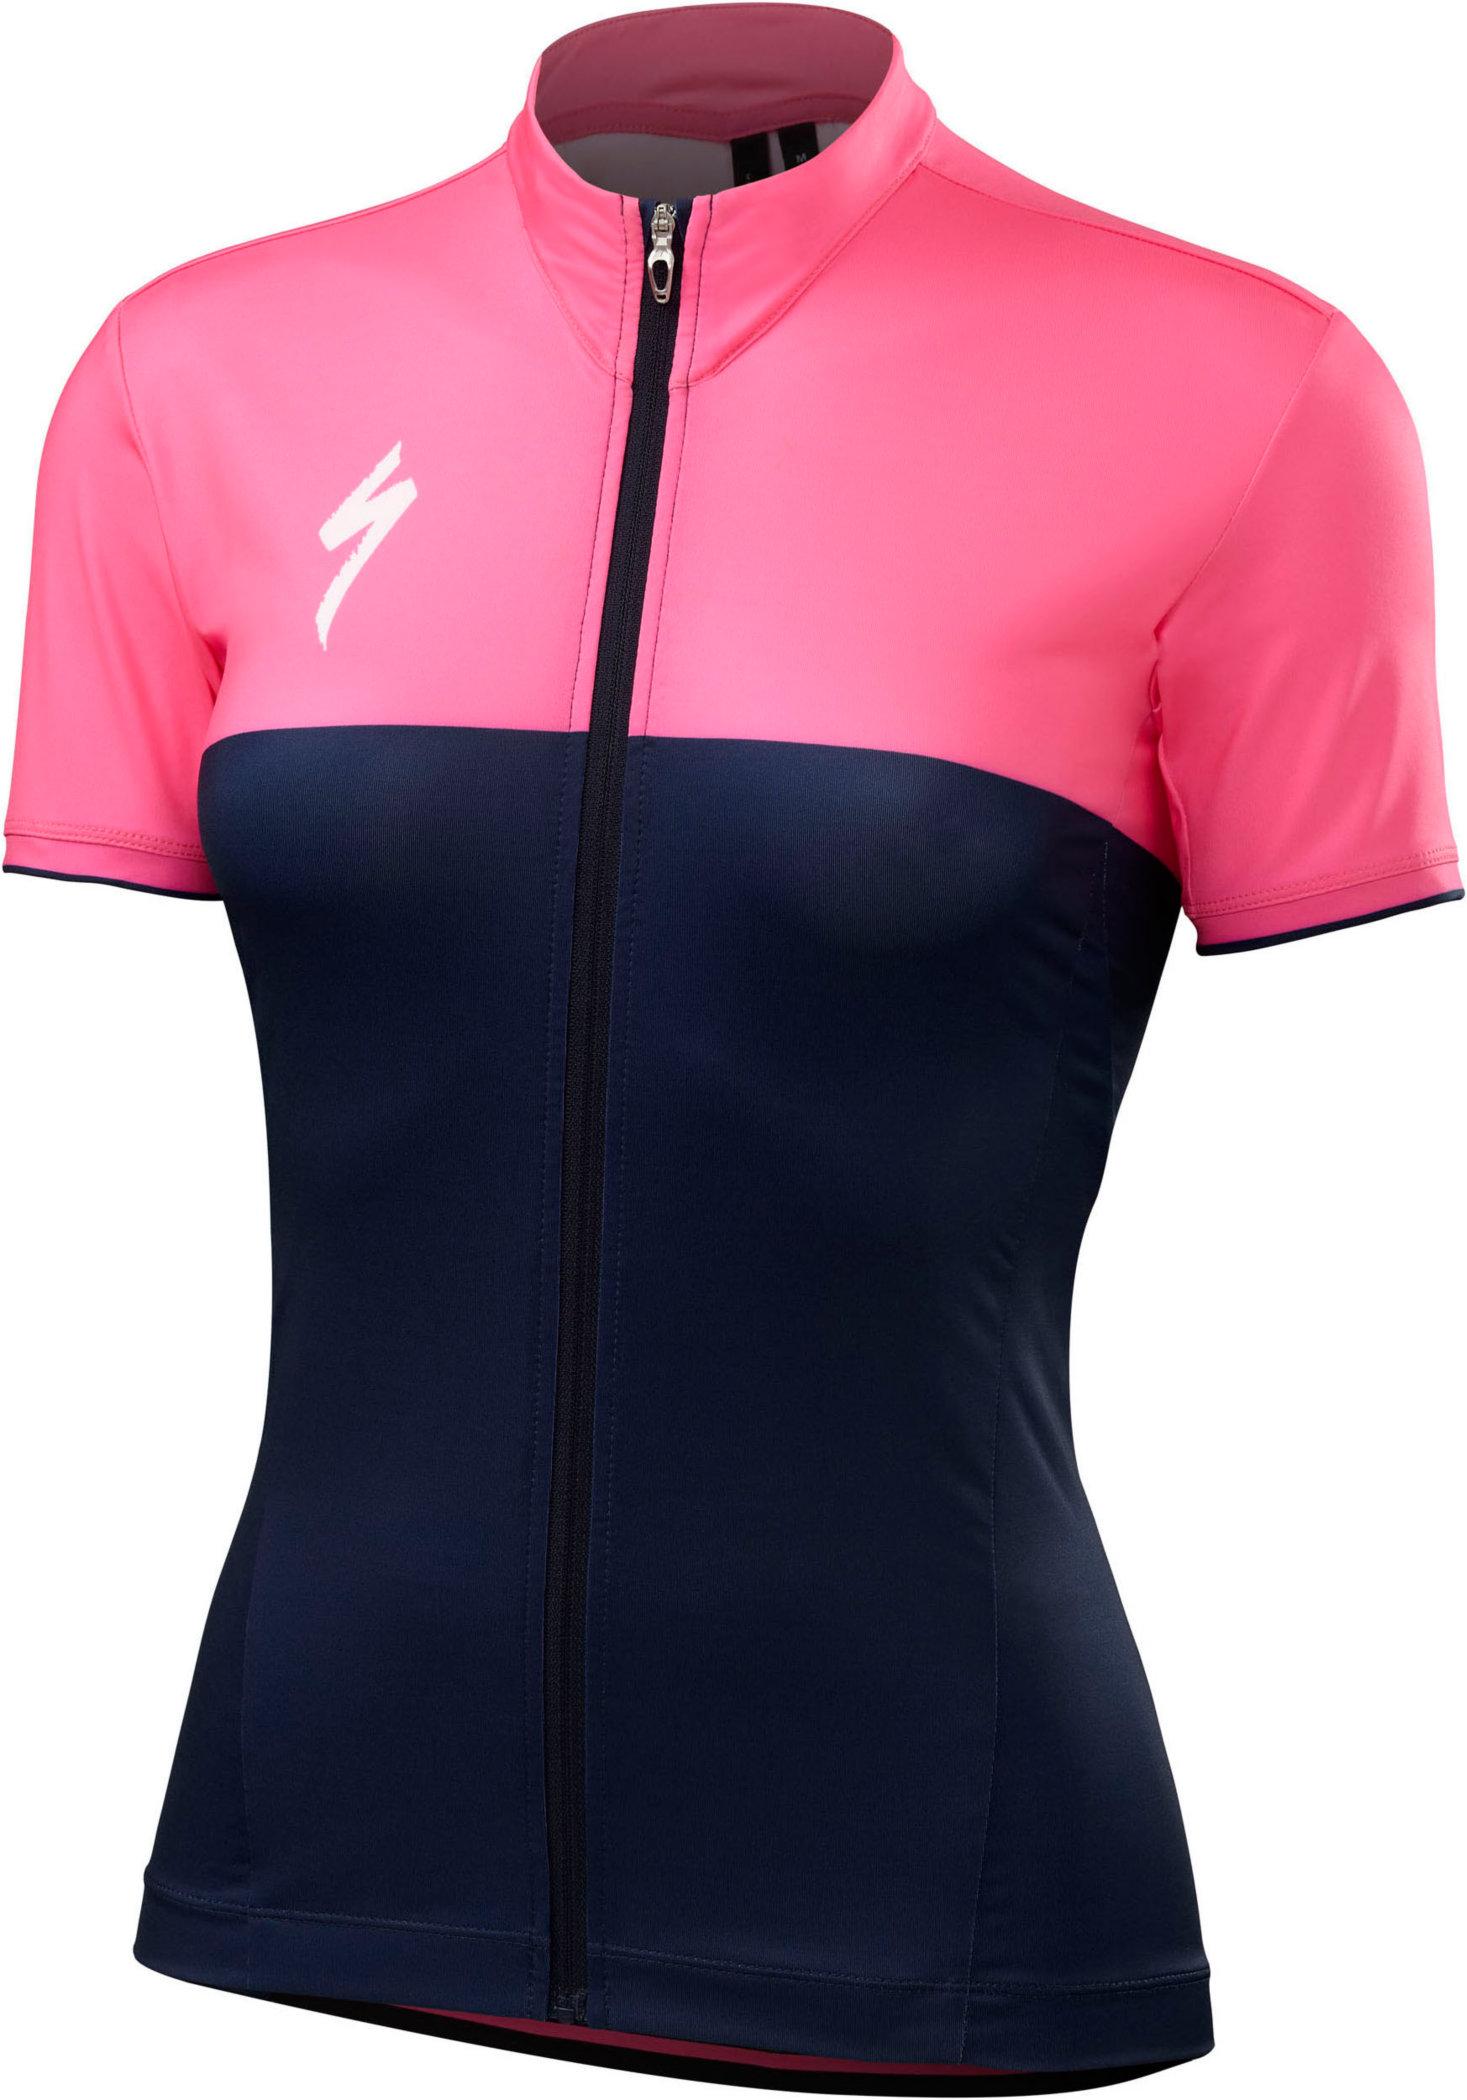 Specialized Women´s RBX Comp Jersey Team Neon Pink Medium - Alpha Bikes